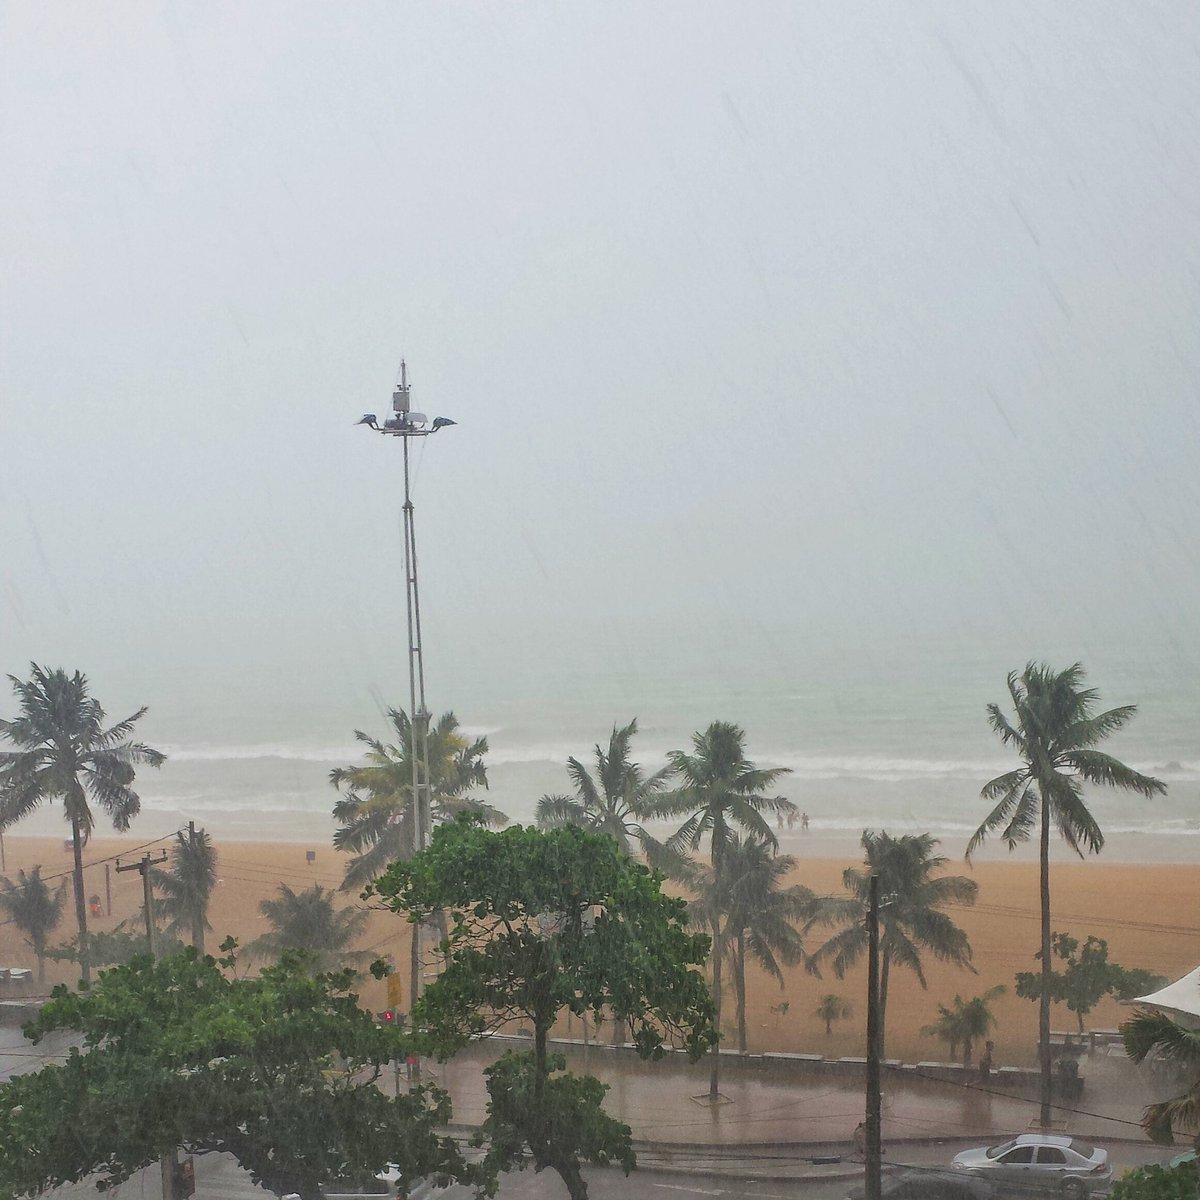 Tromba d'água em Boa Viagem. #Recife #Raincife. @DiarioPE @jctransito https://t.co/hNQtaMLMlw